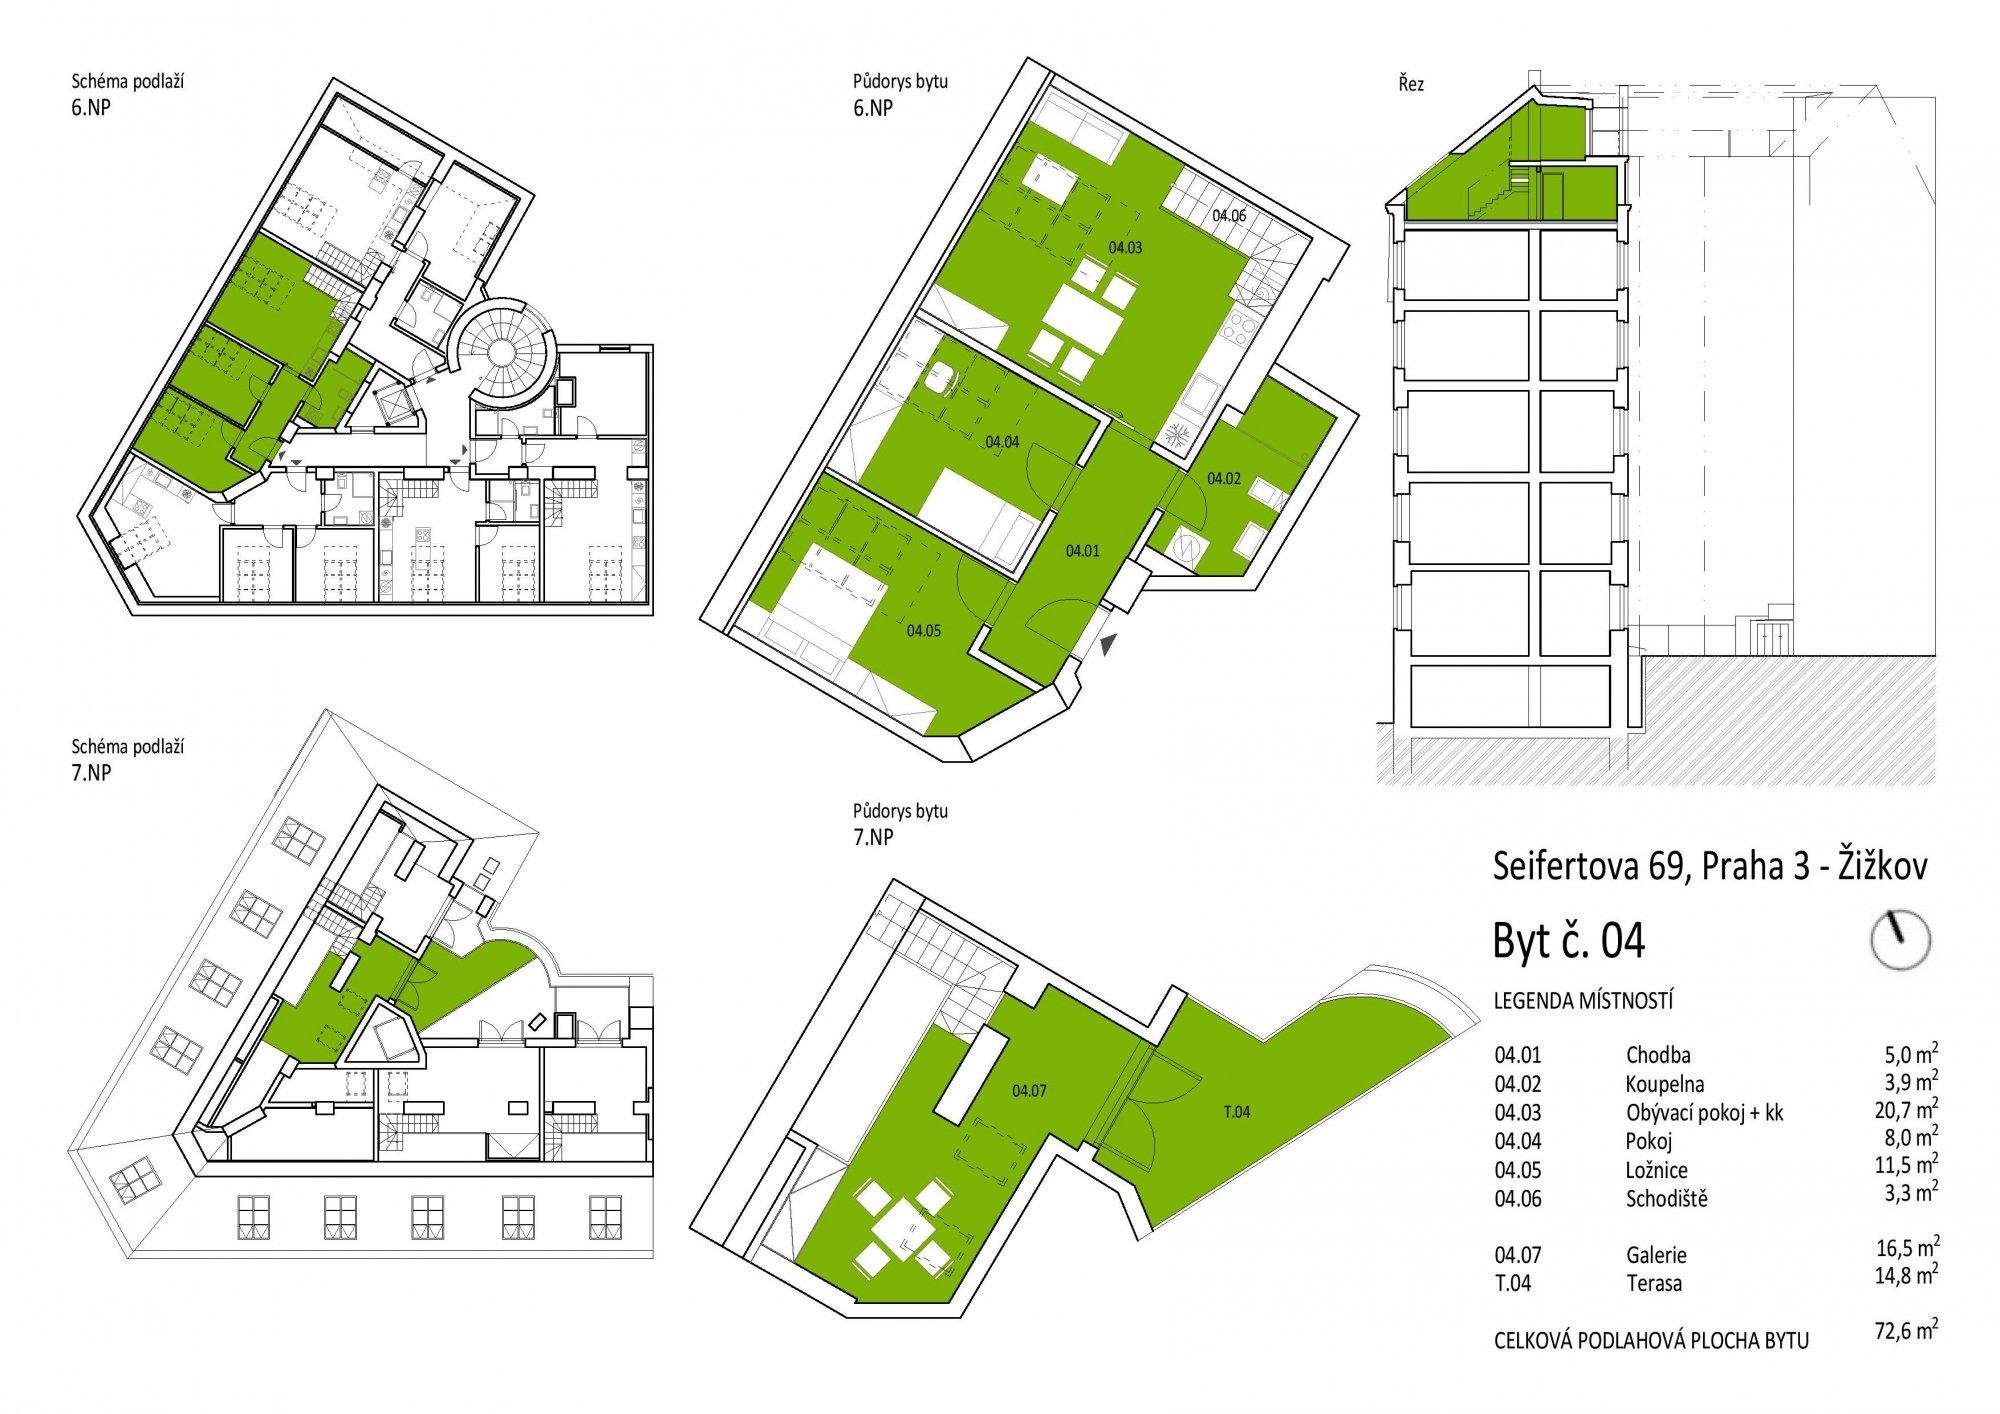 Půdorys - Půdní byt 3+kk, plocha 88 m², ulice Seifertova, Praha 3 - Žižkov